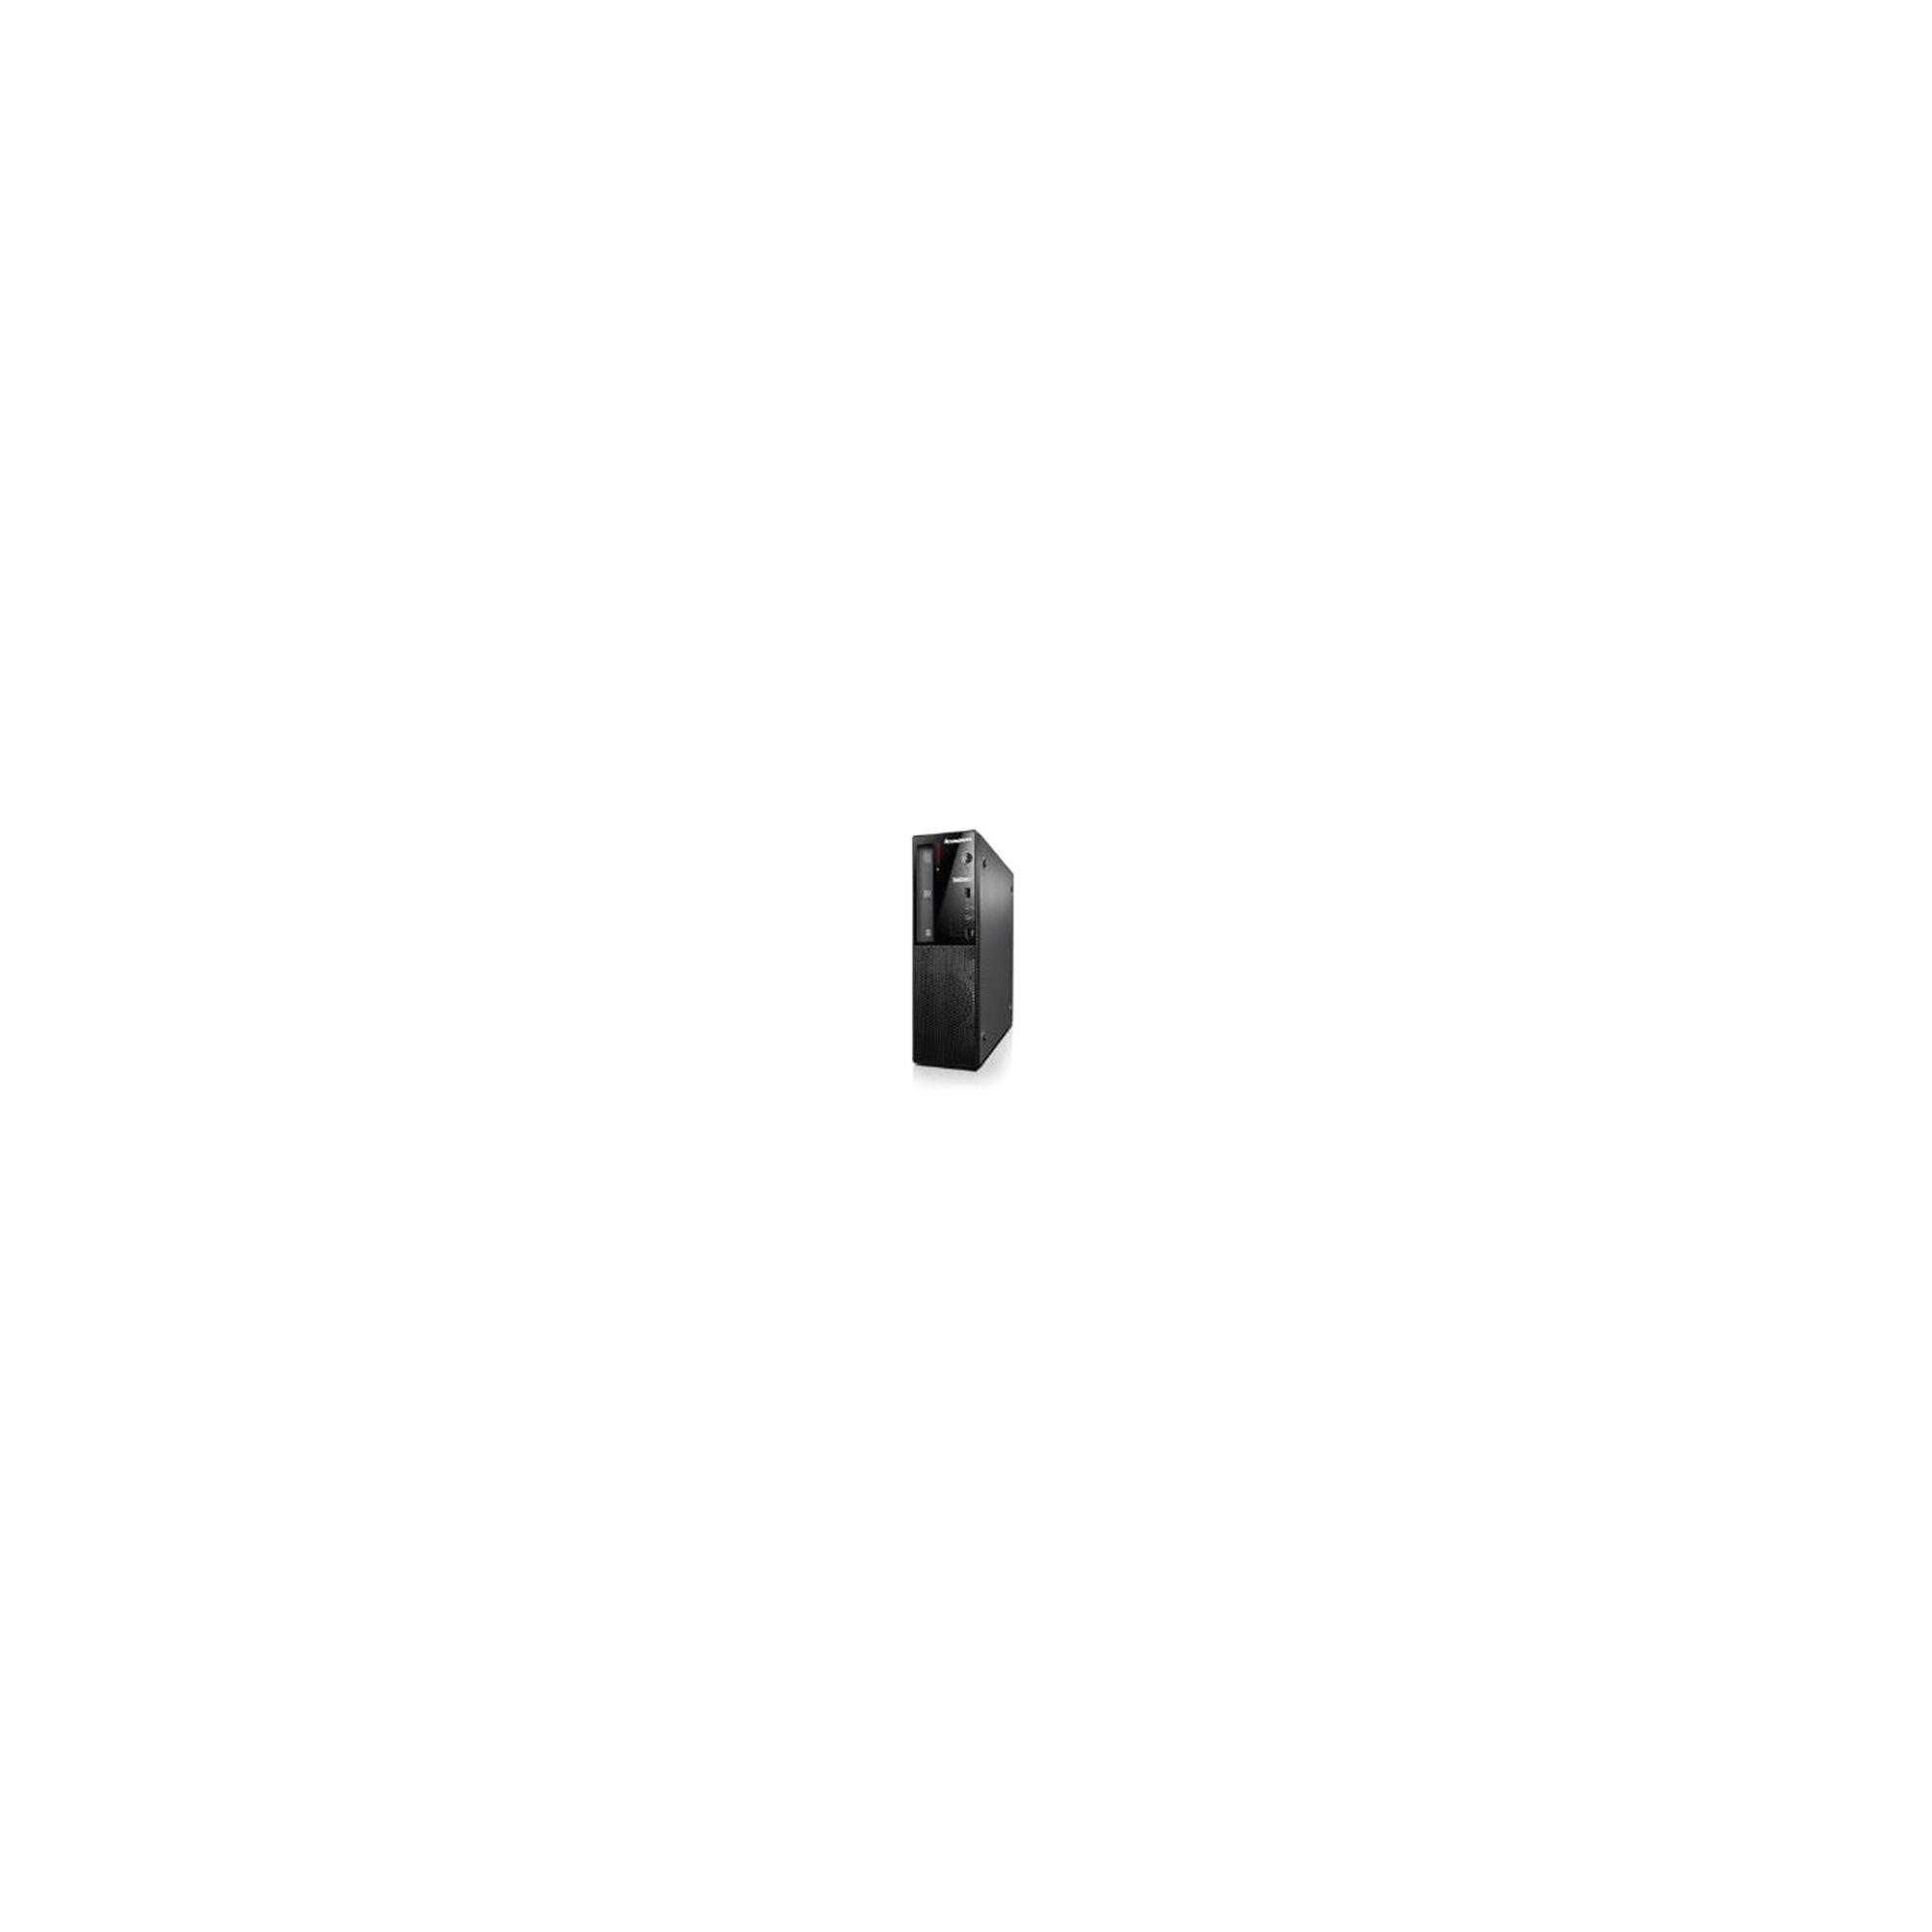 Lenovo ThinkCentre Edge 72 3493AYG Small Desktop PC Core i3 (3220) 3.3GHz 4GB (1x4GB) 500GB DVD?RW LAN Windows 7 Pro 64-bit/Win 8 Pro RDVD (Intel